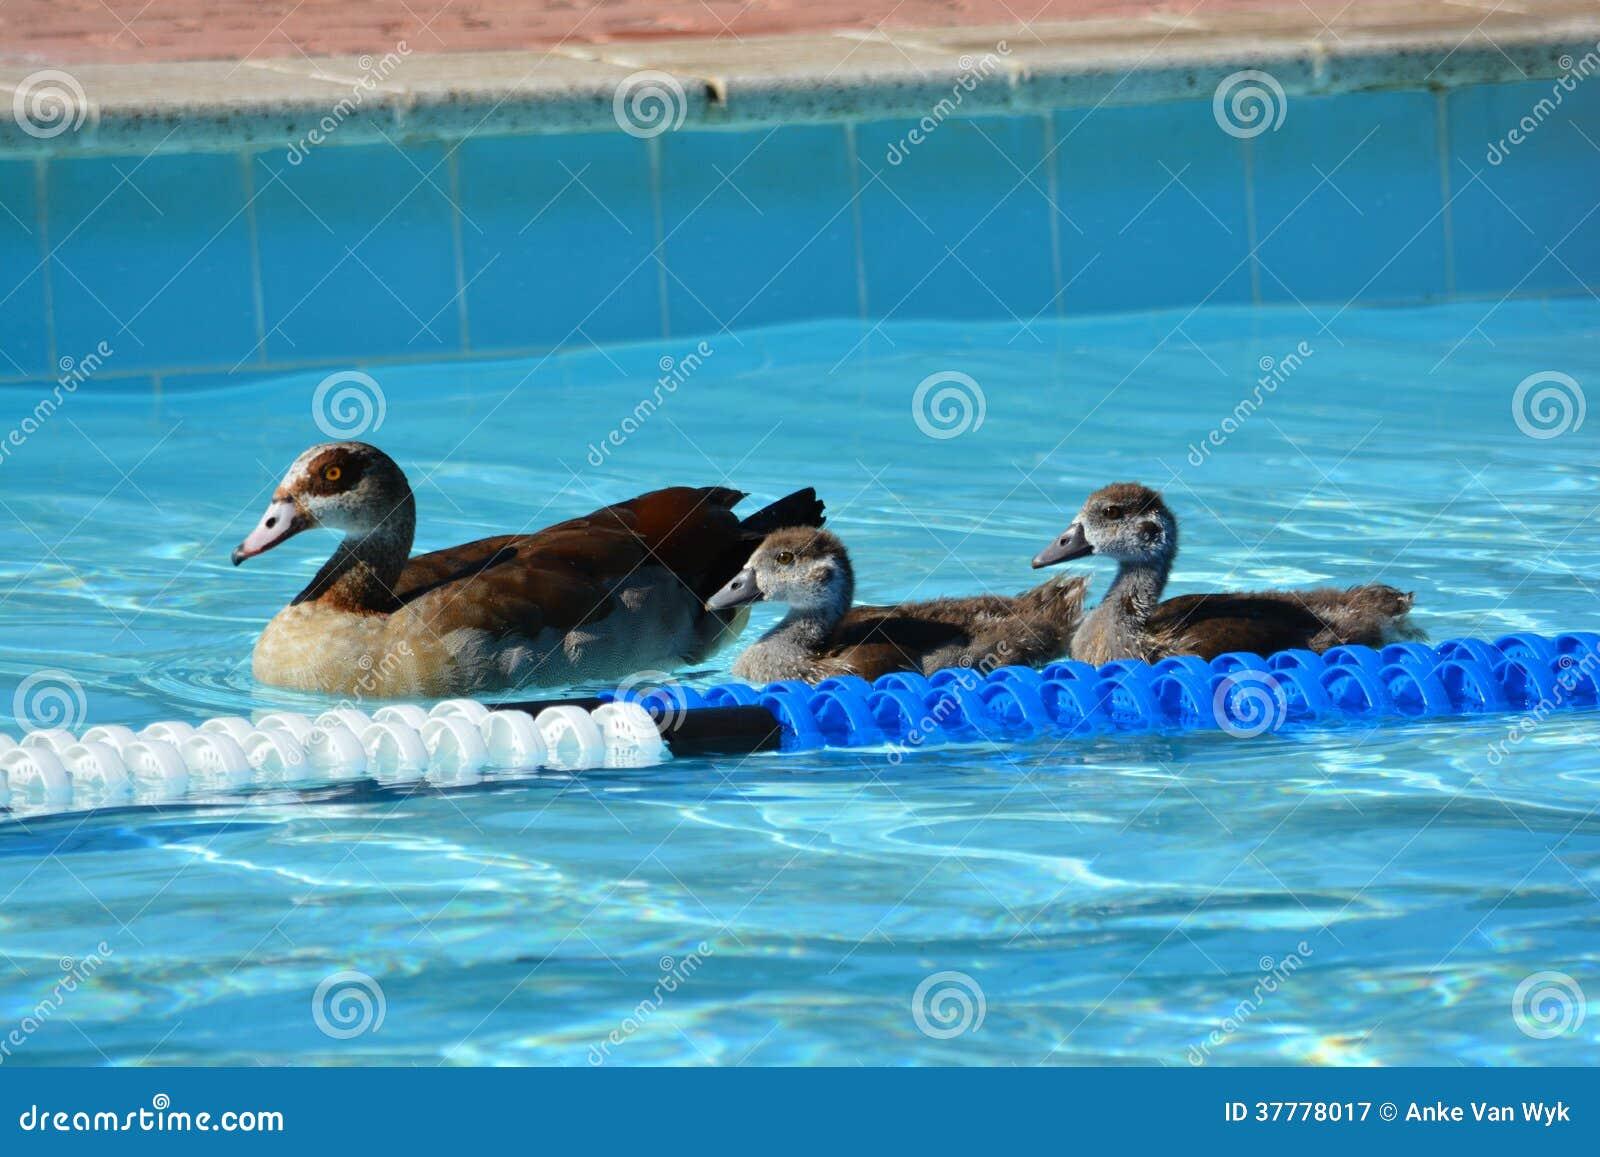 Summer Fun Royalty Free Stock Photography Image 37778017